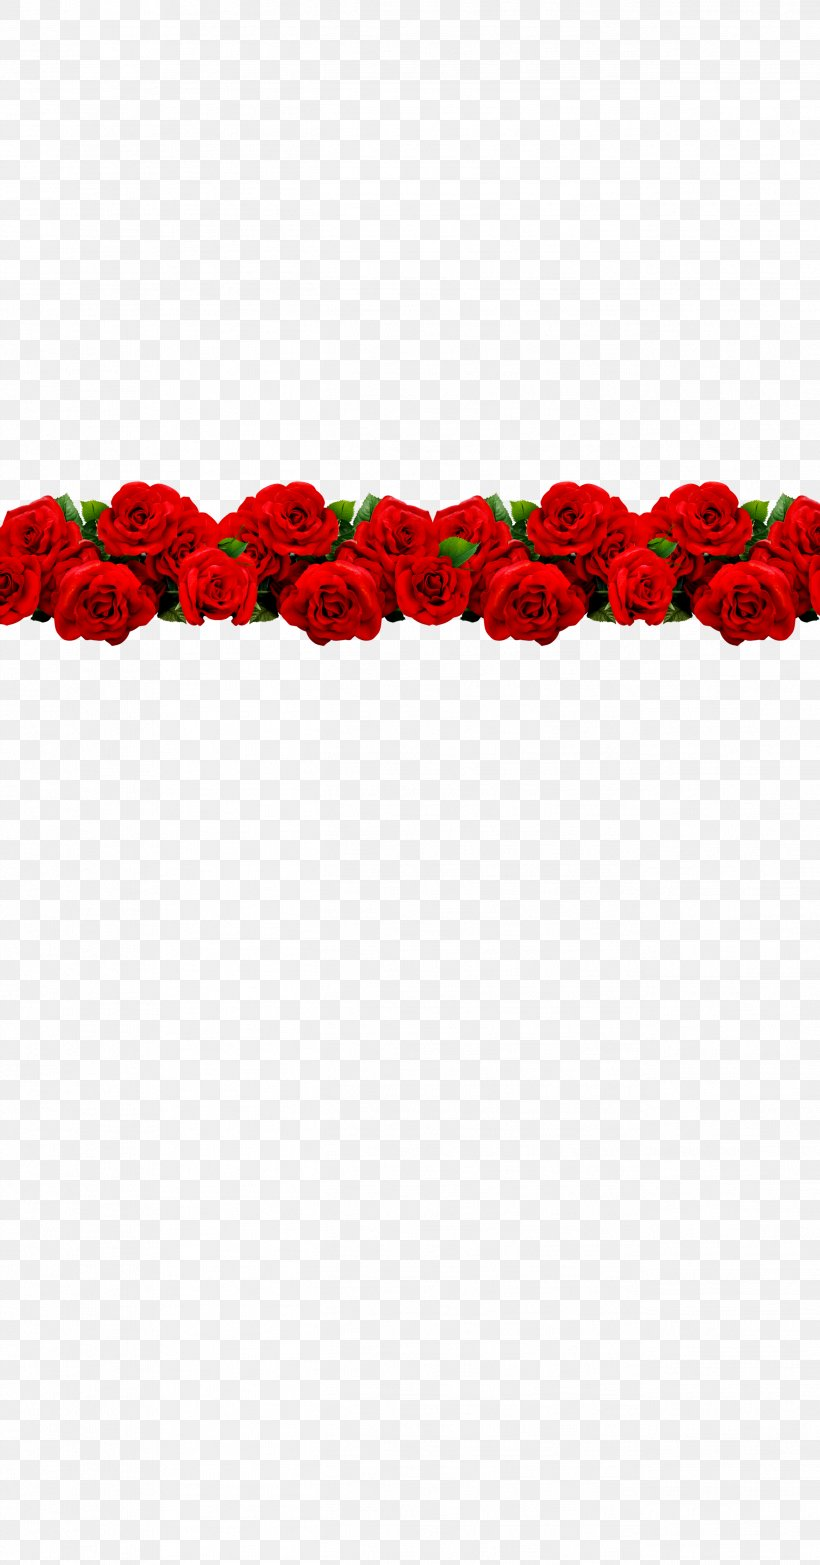 Textile Petal Pattern, PNG, 2598x4961px, Textile, Heart, Petal, Point, Rectangle Download Free